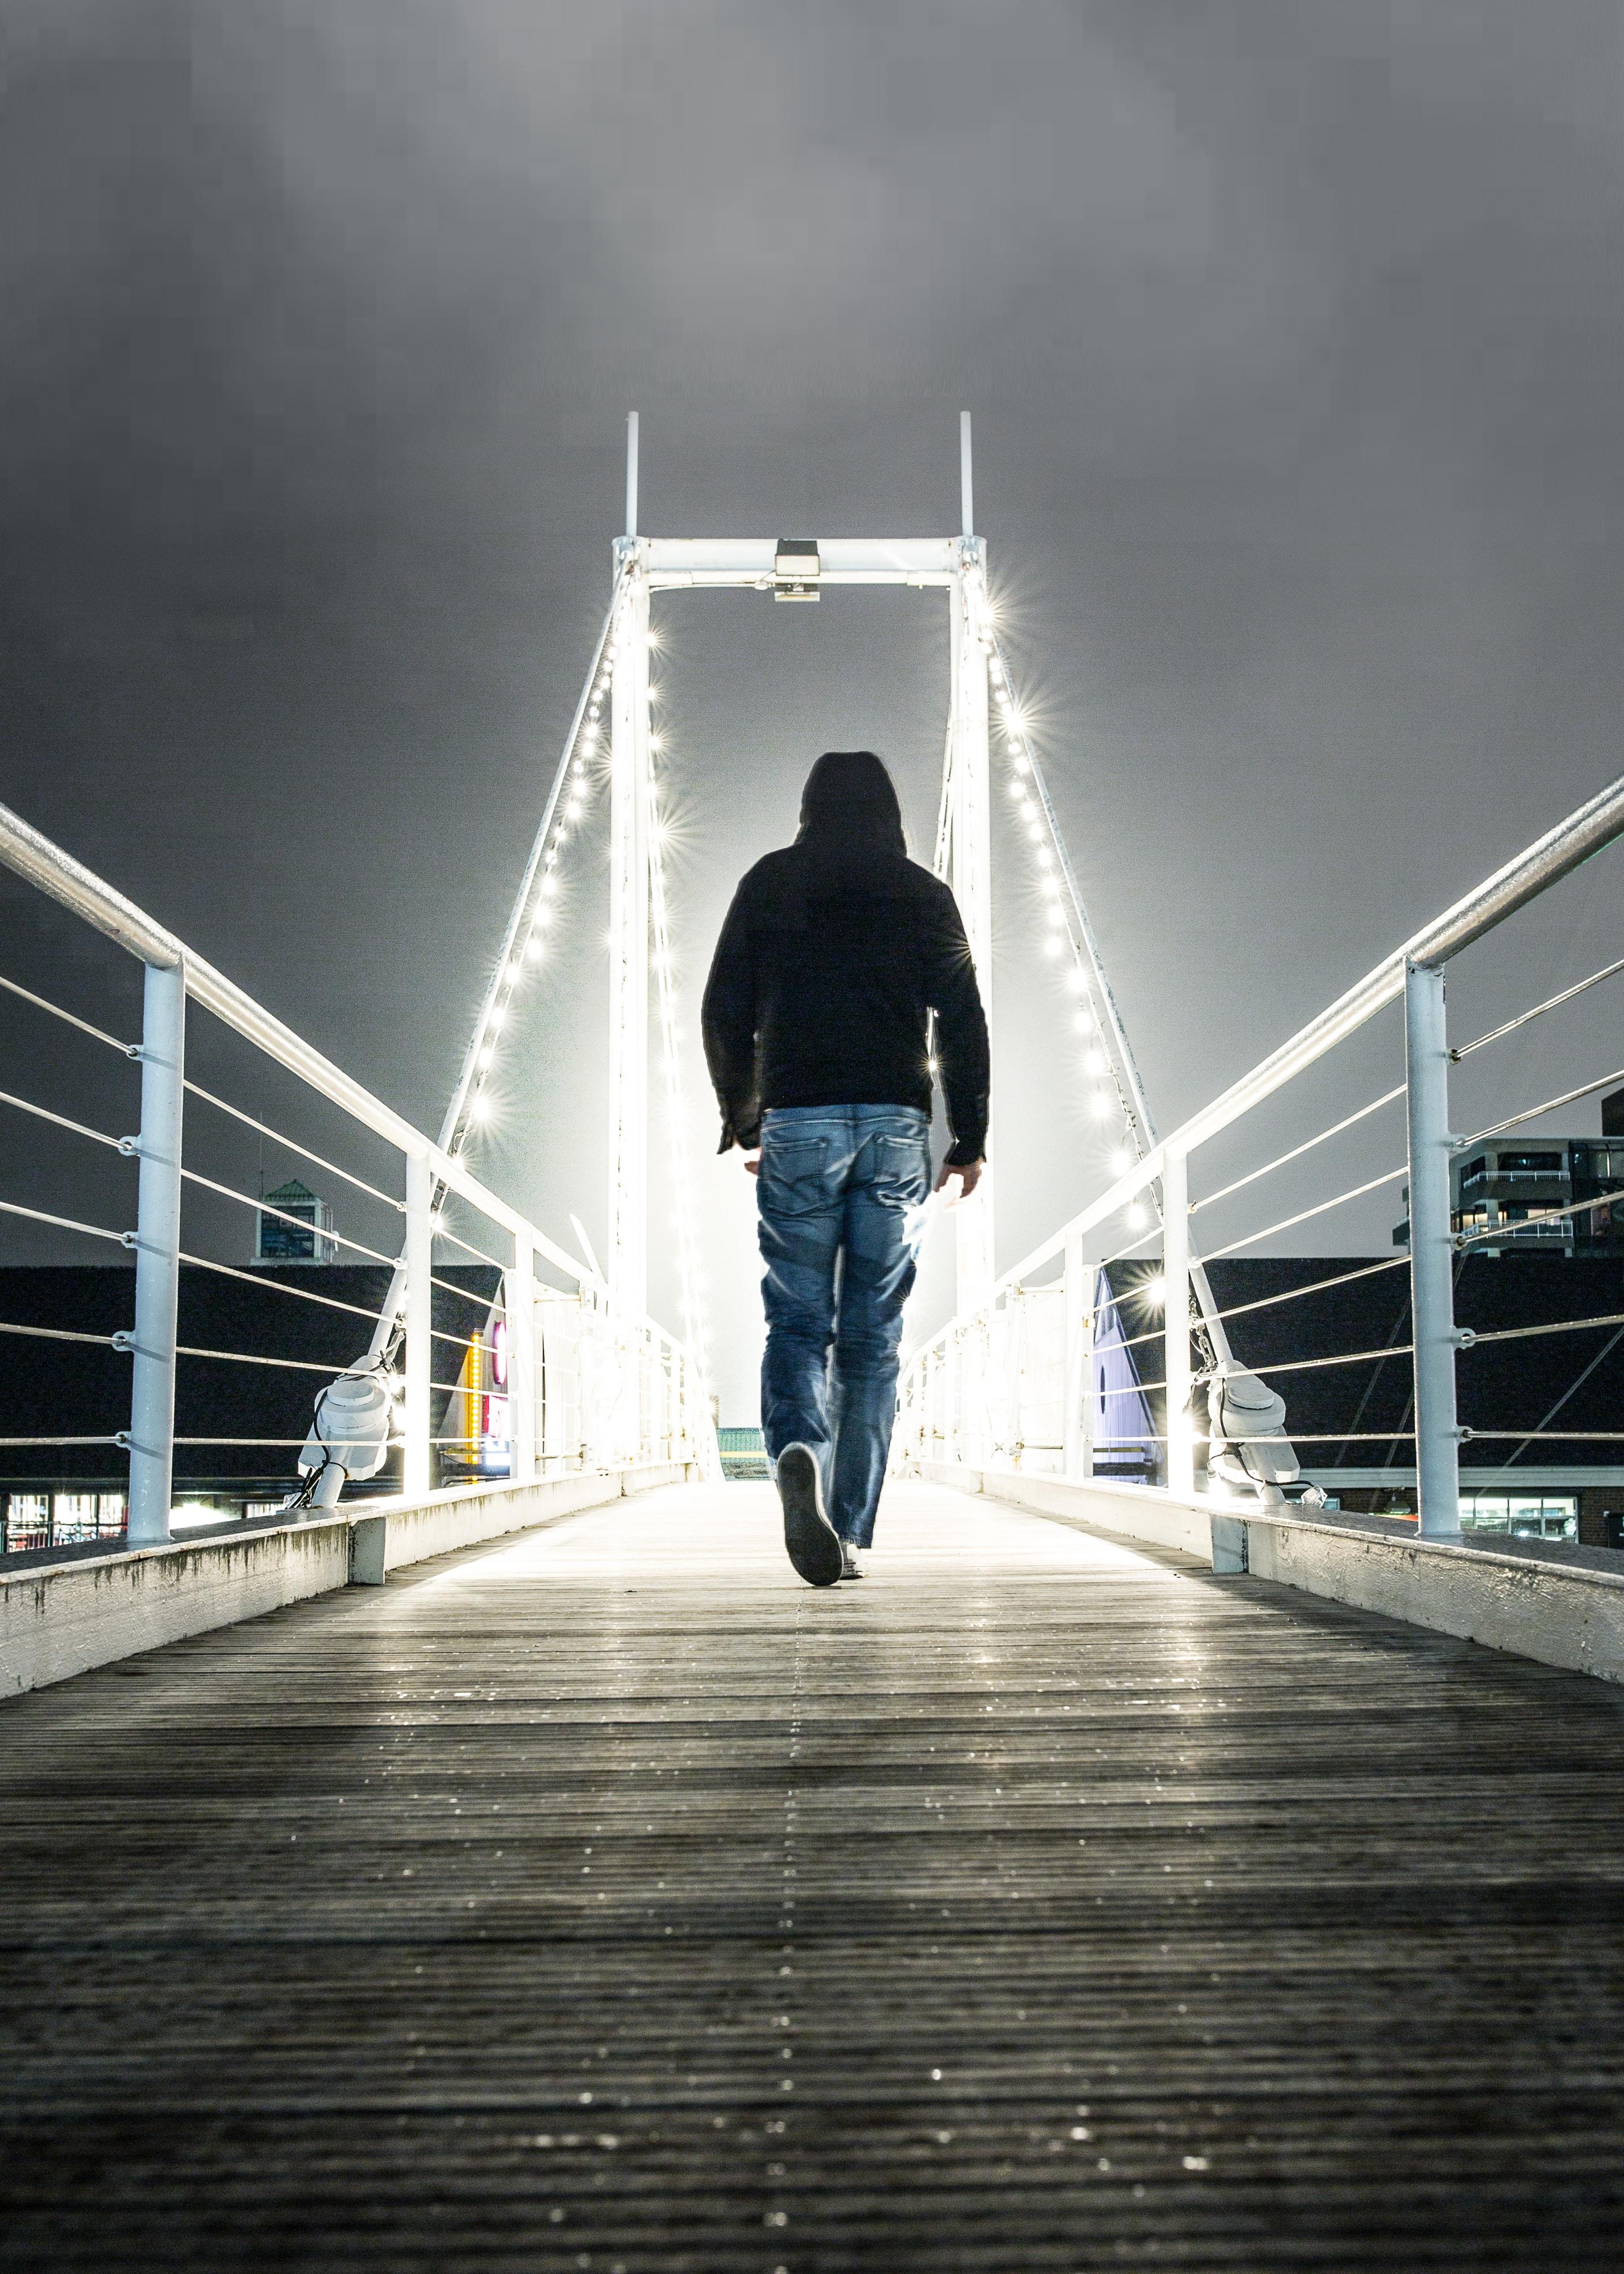 Free Unsplash photo from Filip Mroz